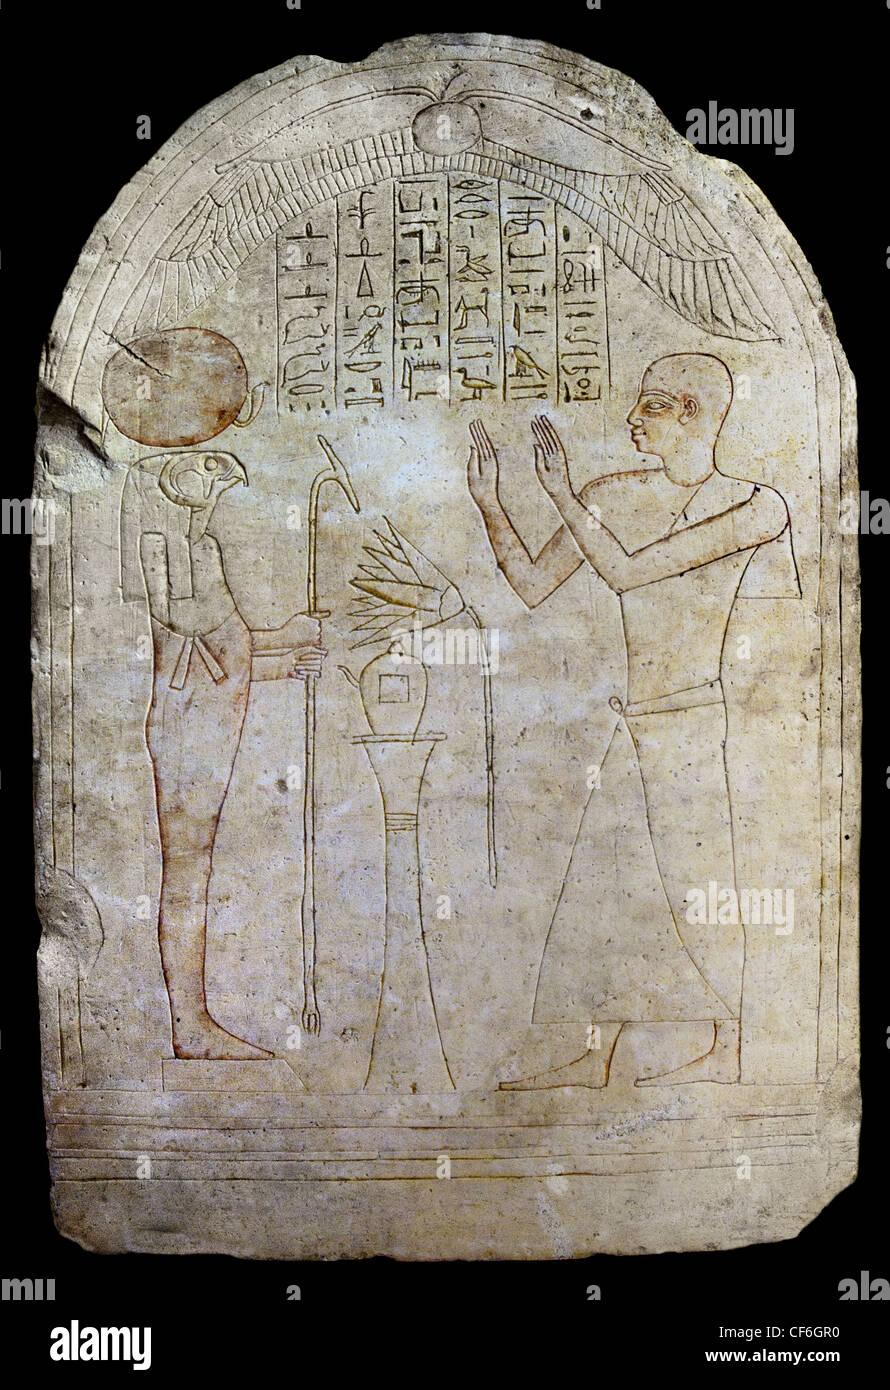 Stele Irtyrtcha priest of Osiris and goldsmith of Amon Ra loves Horakhti  25 - 26 Dynasty 685-525 BC Egypt Egyptian - Stock Image